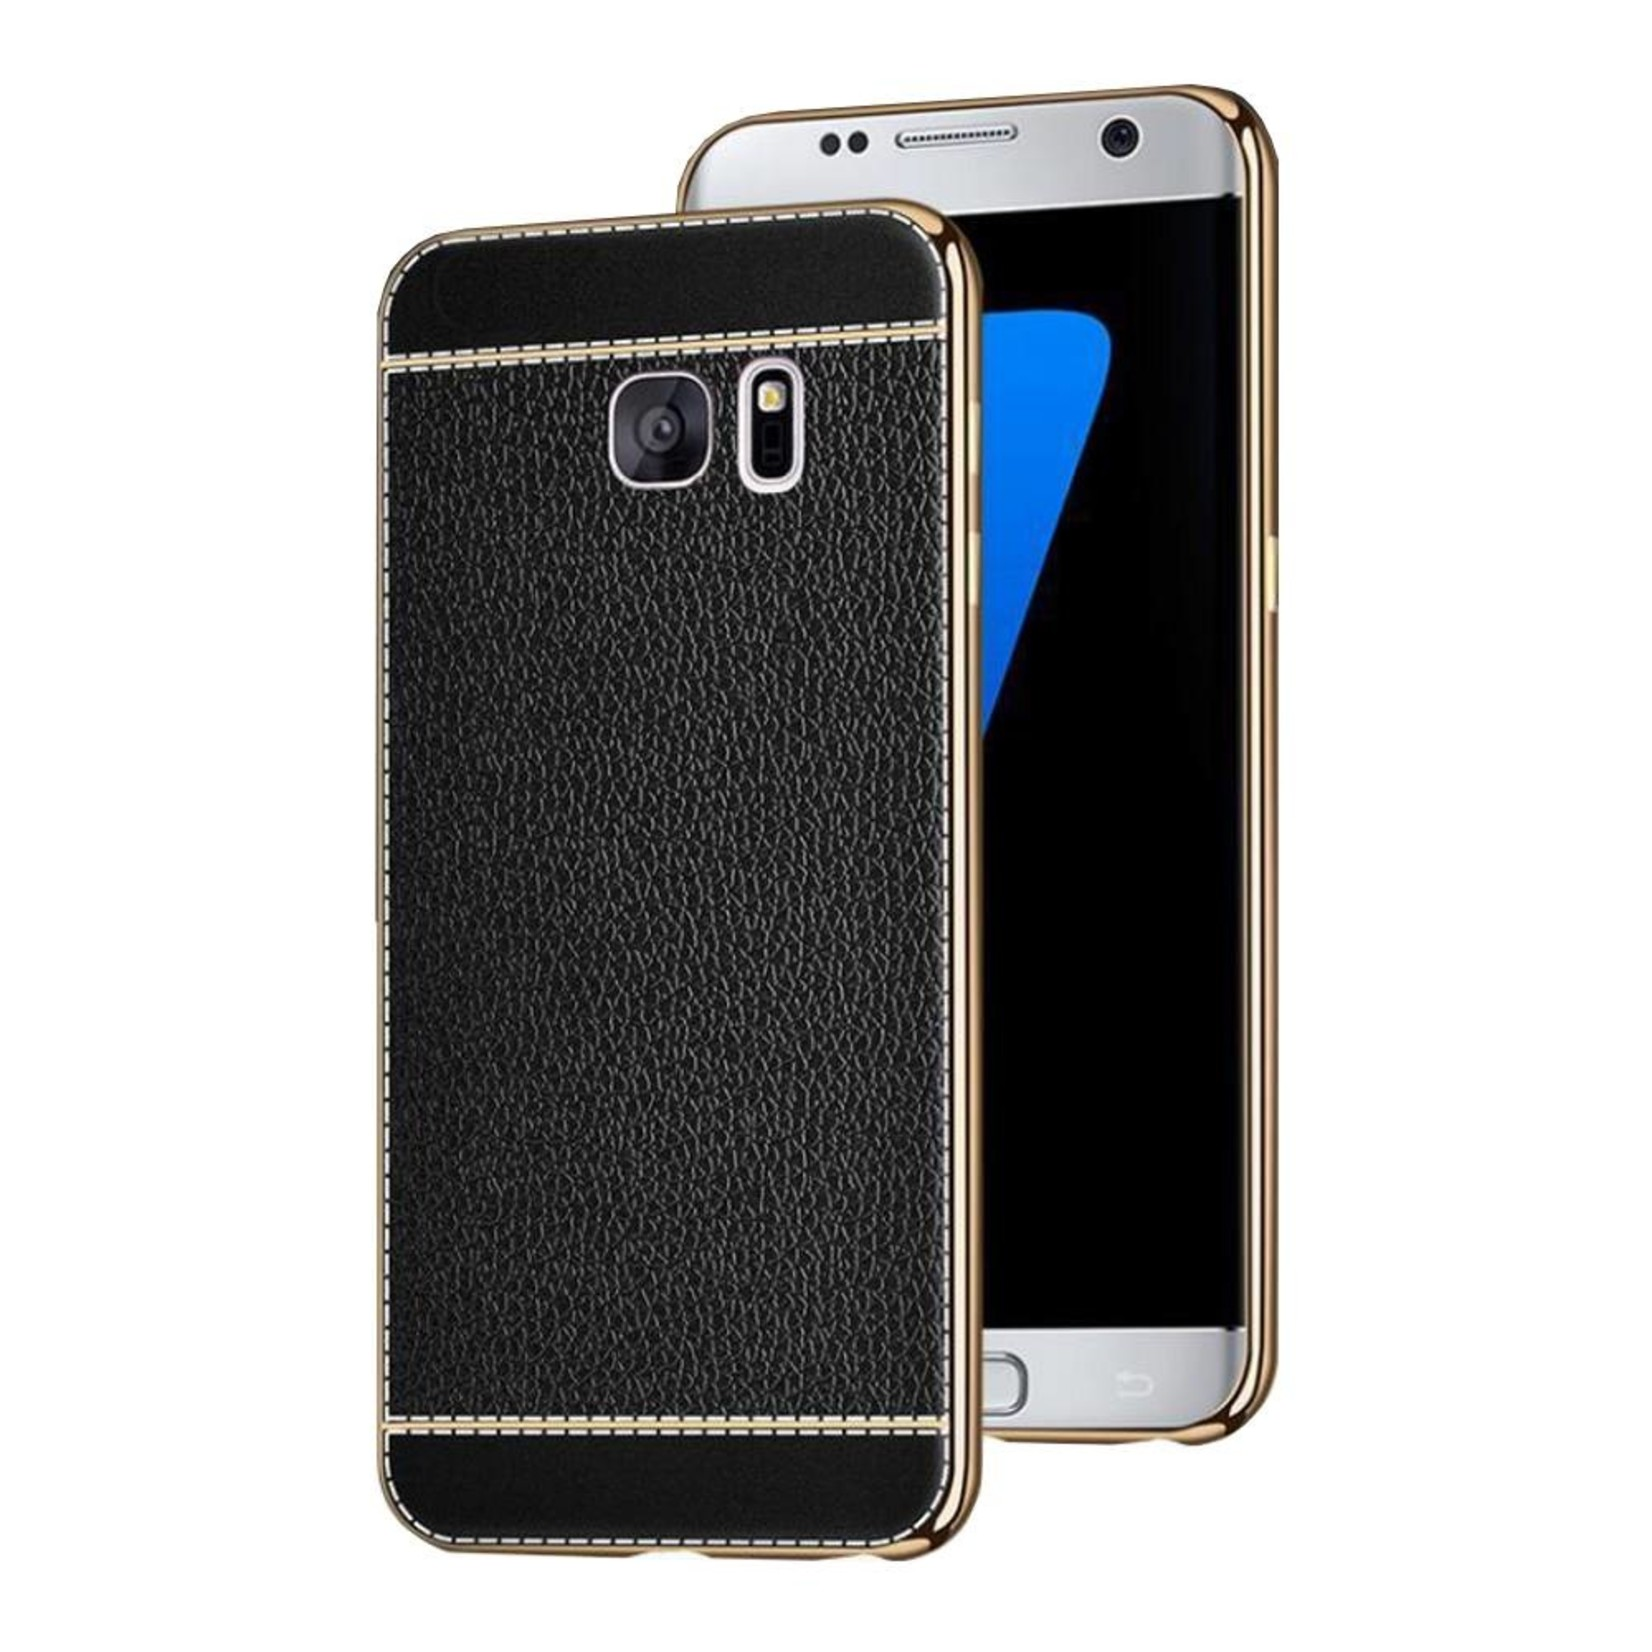 Colorfone CoolSkin Leather voor Samsung S7 Edge Zwart